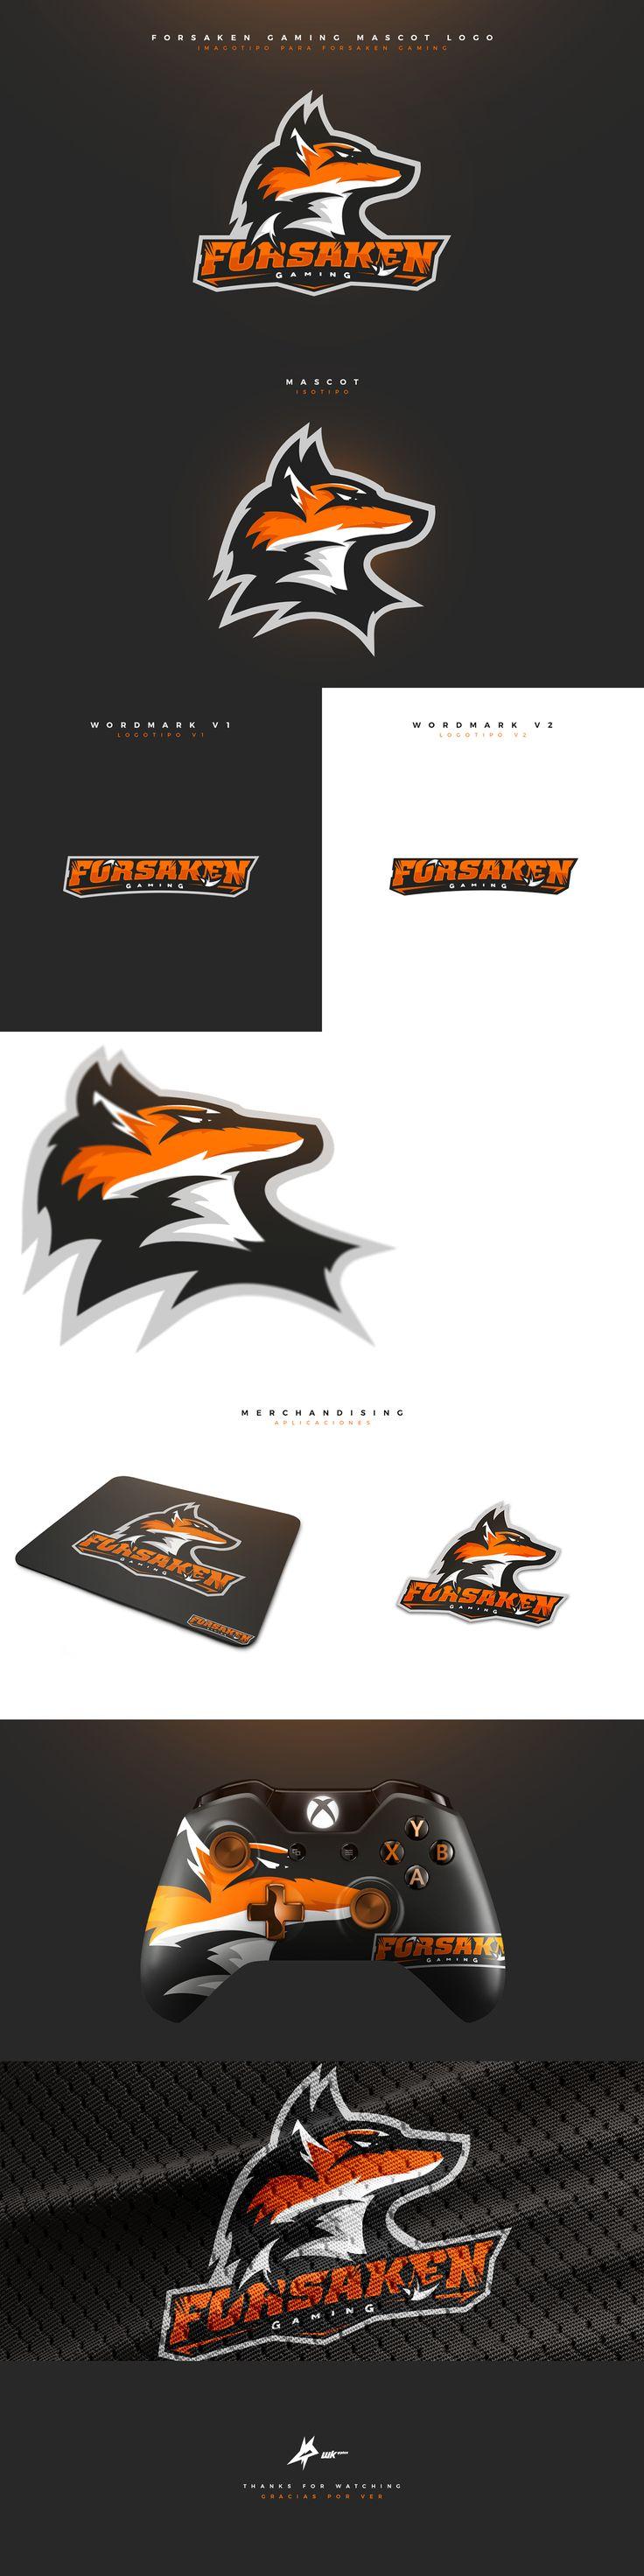 "Check out my @Behance project: ""Forsaken Gaming Mascot Logo."" https://www.behance.net/gallery/47138353/Forsaken-Gaming-Mascot-Logo #mascot #logo #esports #sports #branding #brand #fox #gaming #mascotlogo"